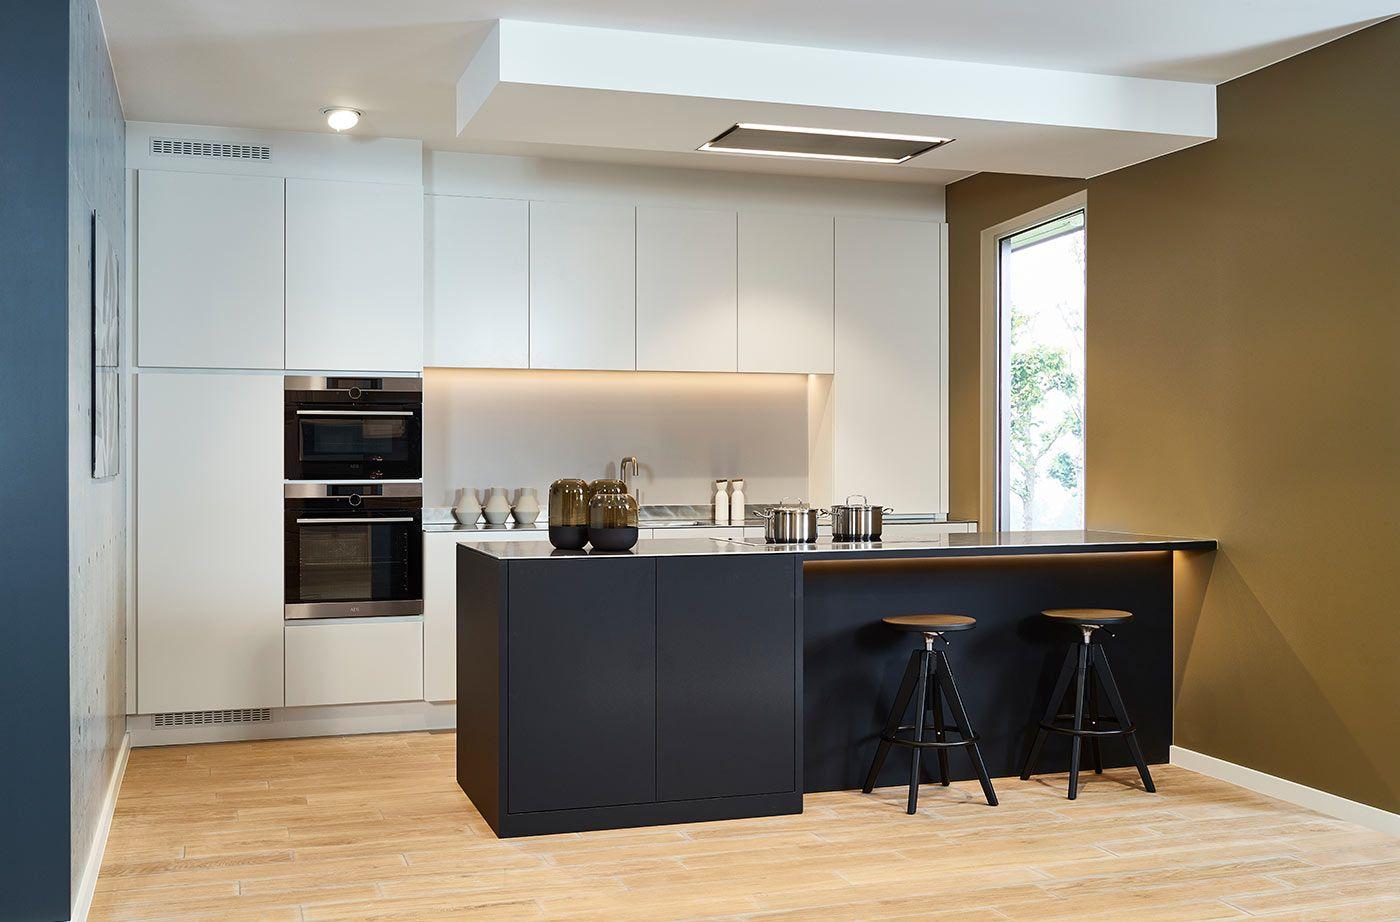 Ikea Keuken Zwart : Ikea keuken zwart mat kitchen ideas vans showroom